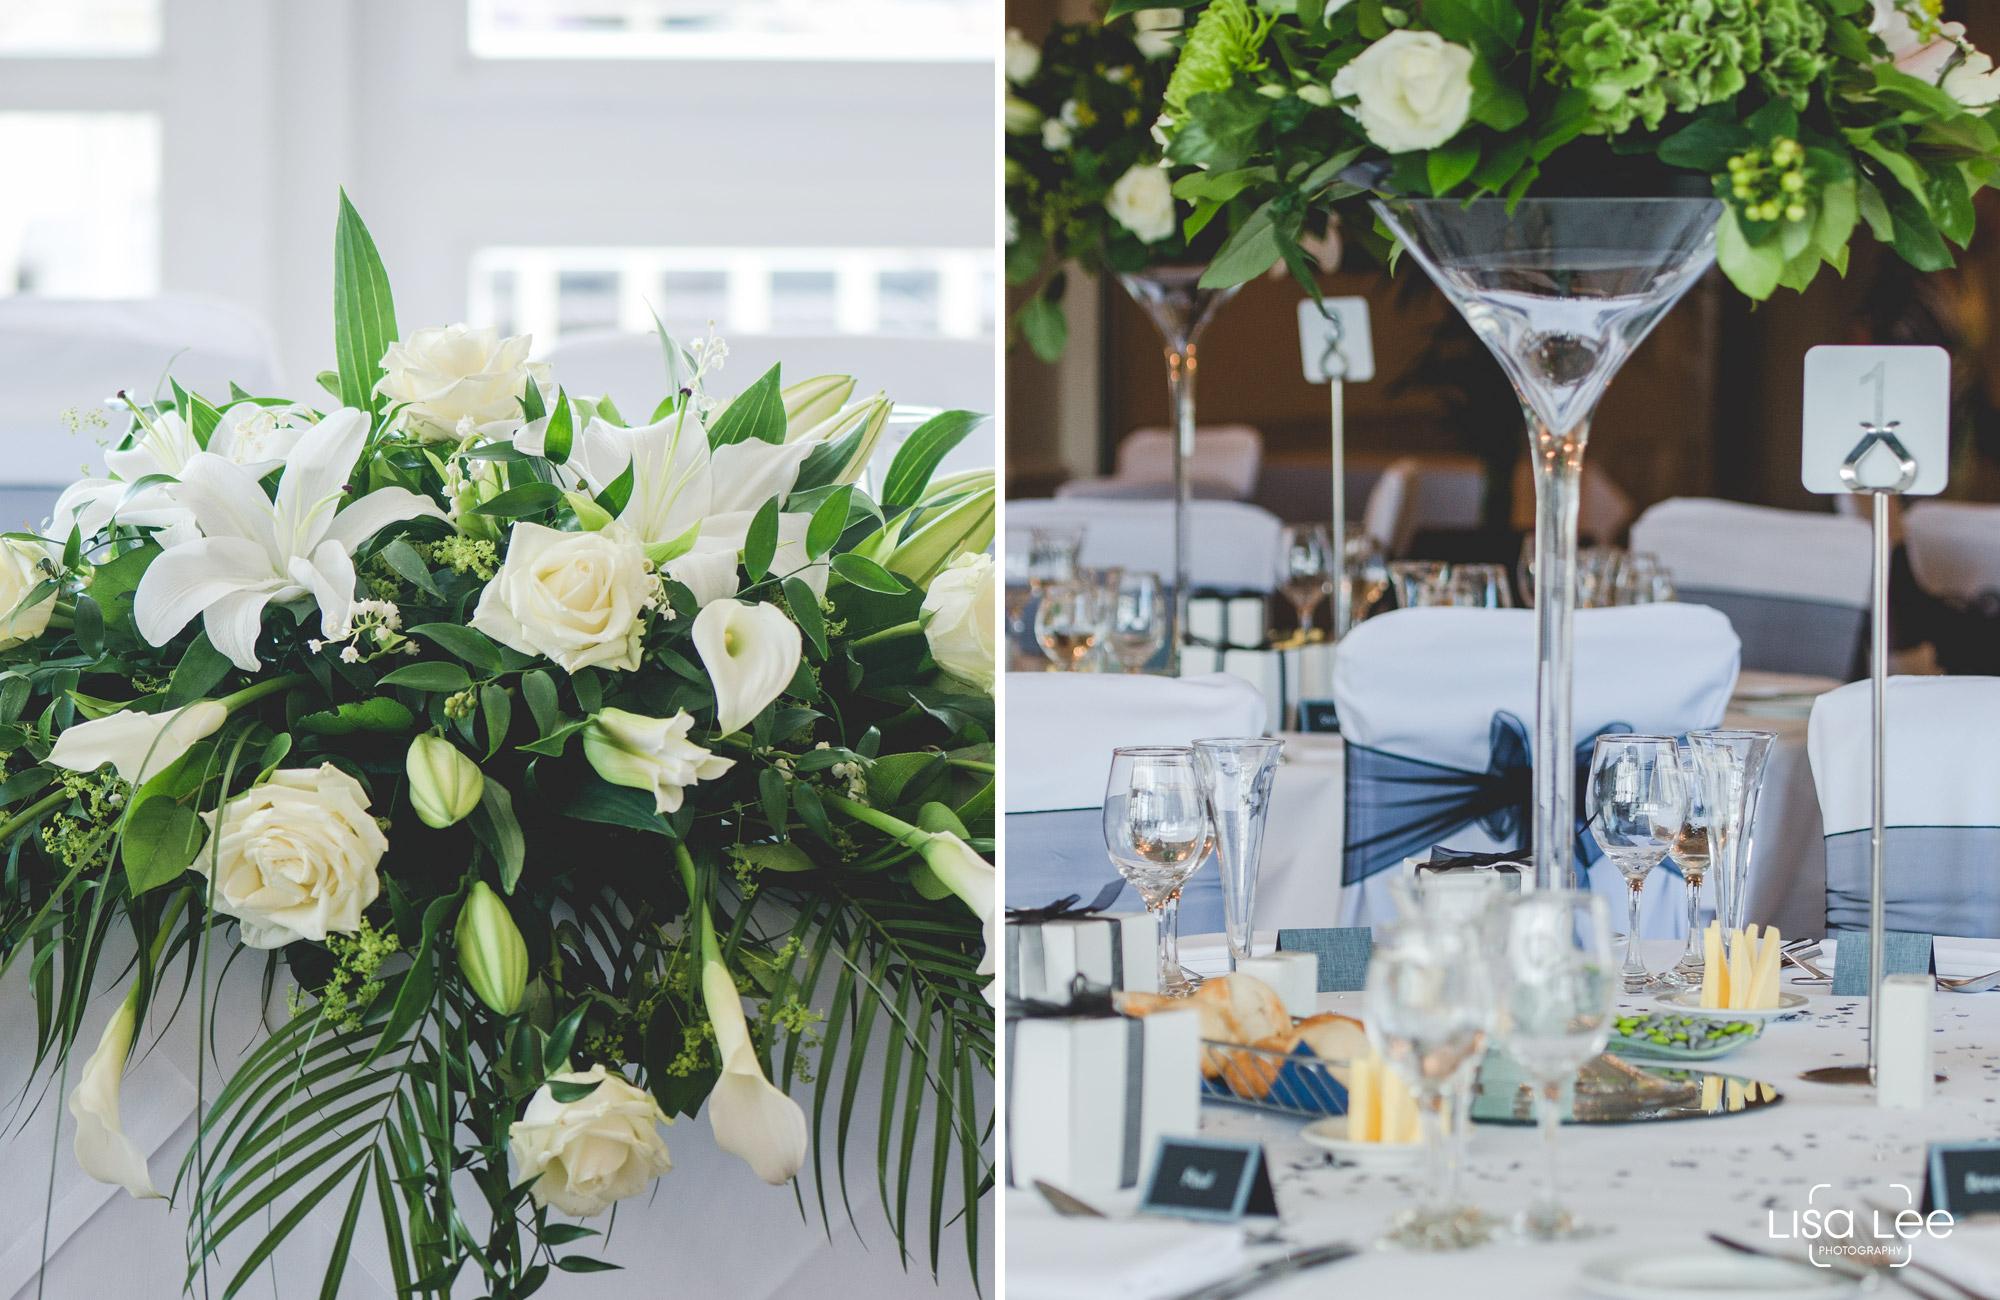 lisa-lee-wedding-photography-christchurch-dorset-flowers4.jpg